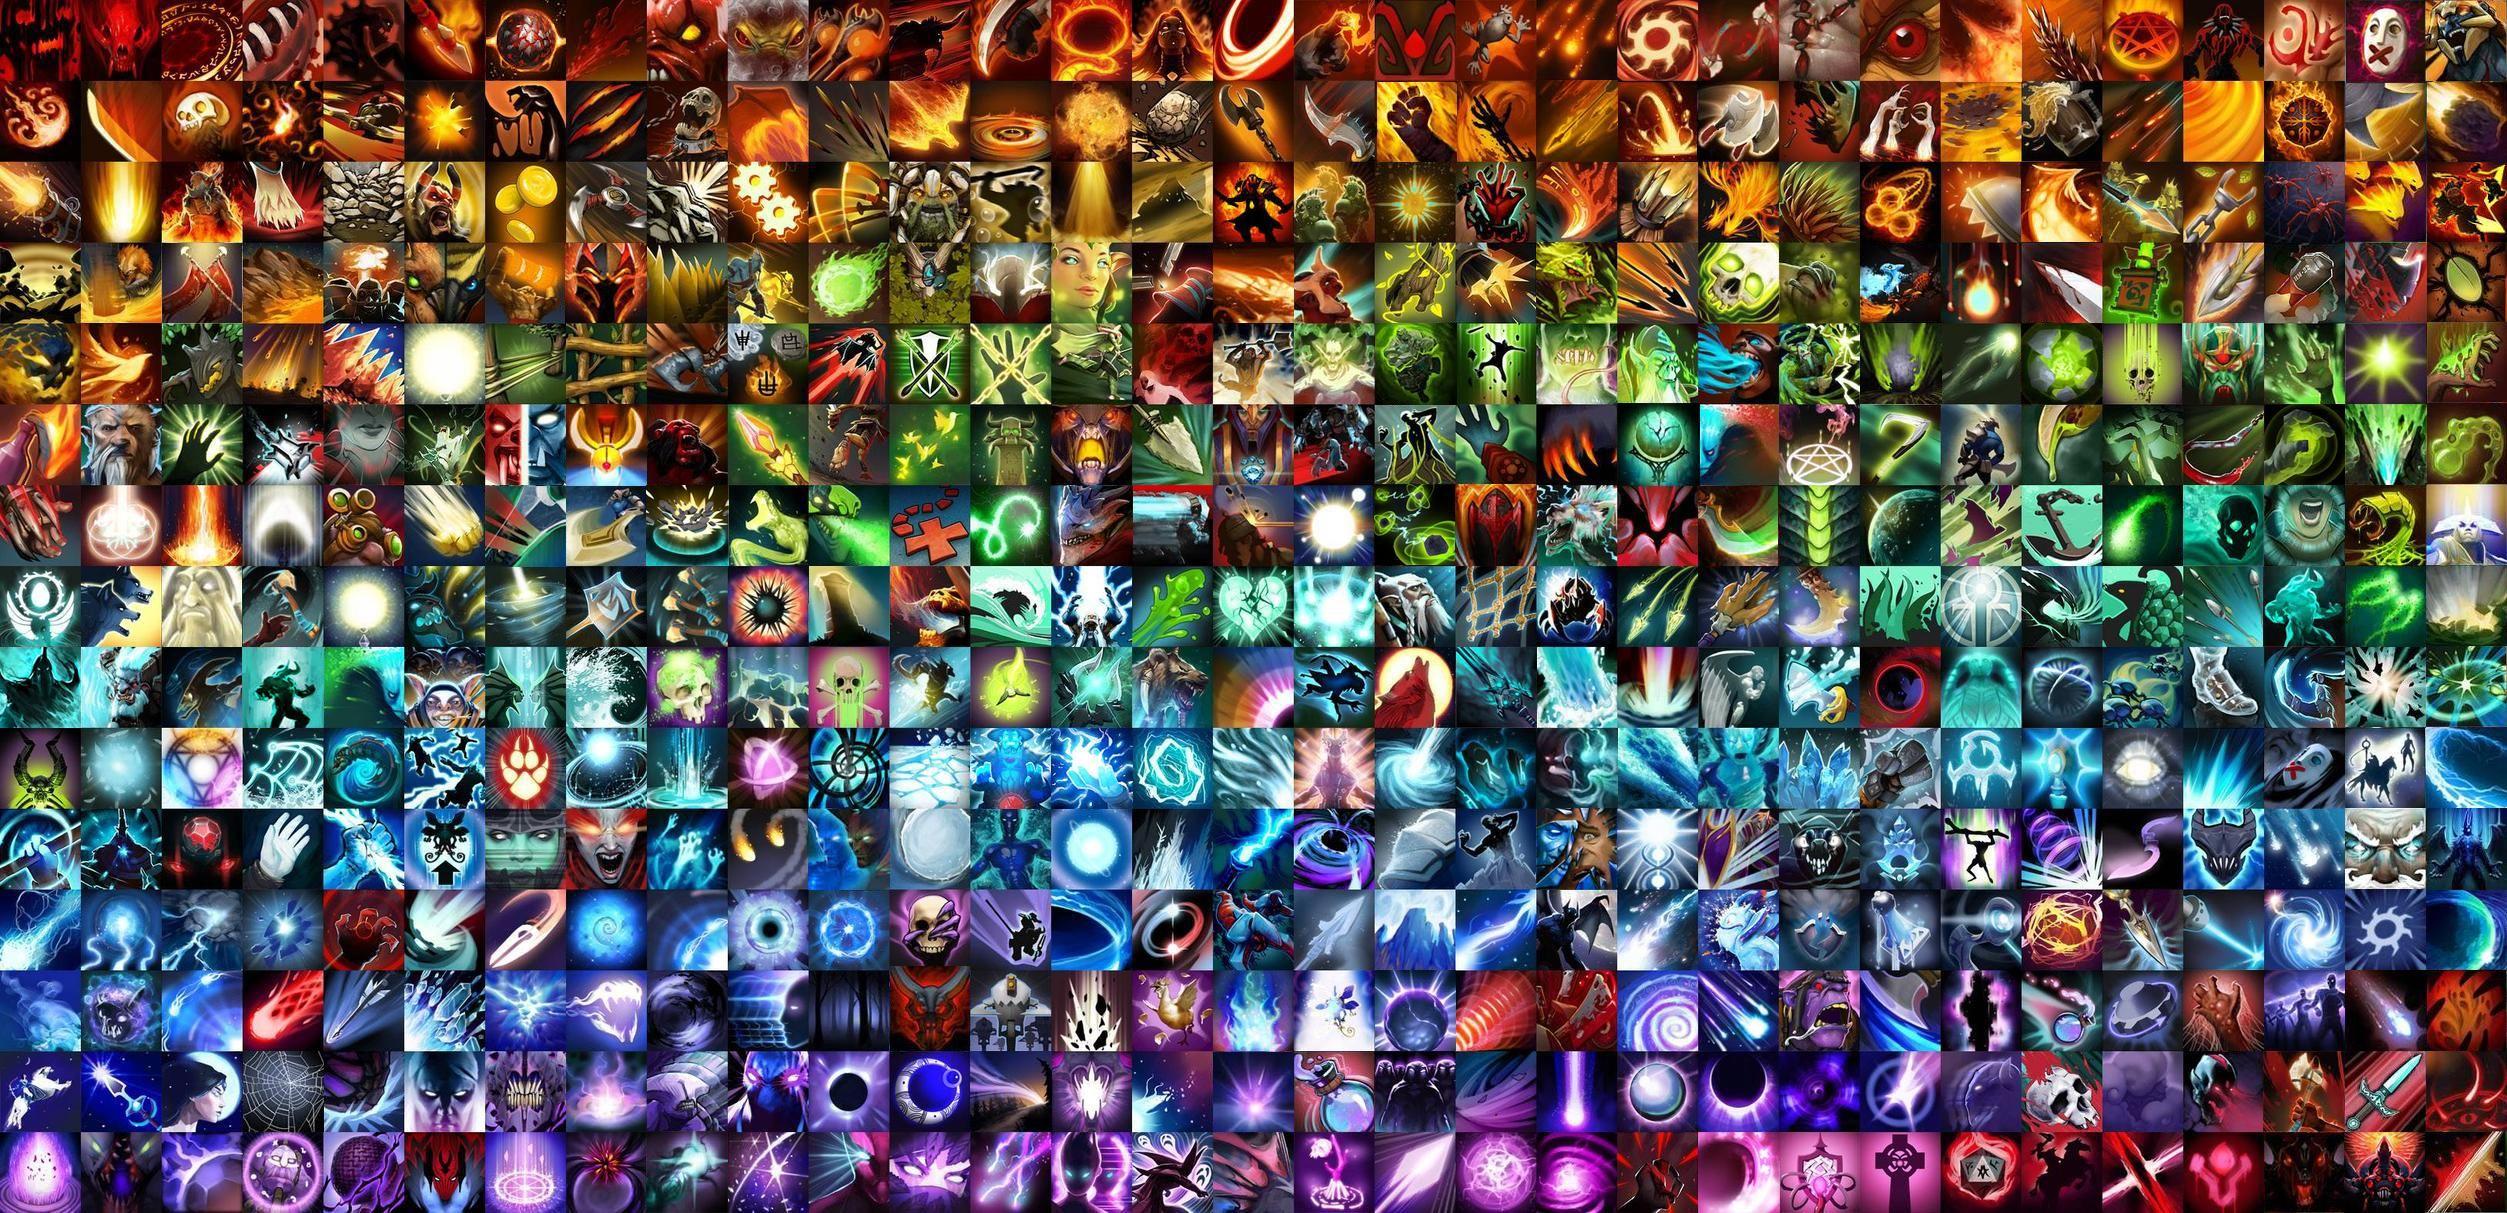 Dota 2 Ability icons Desktop photos, Icons and Game design